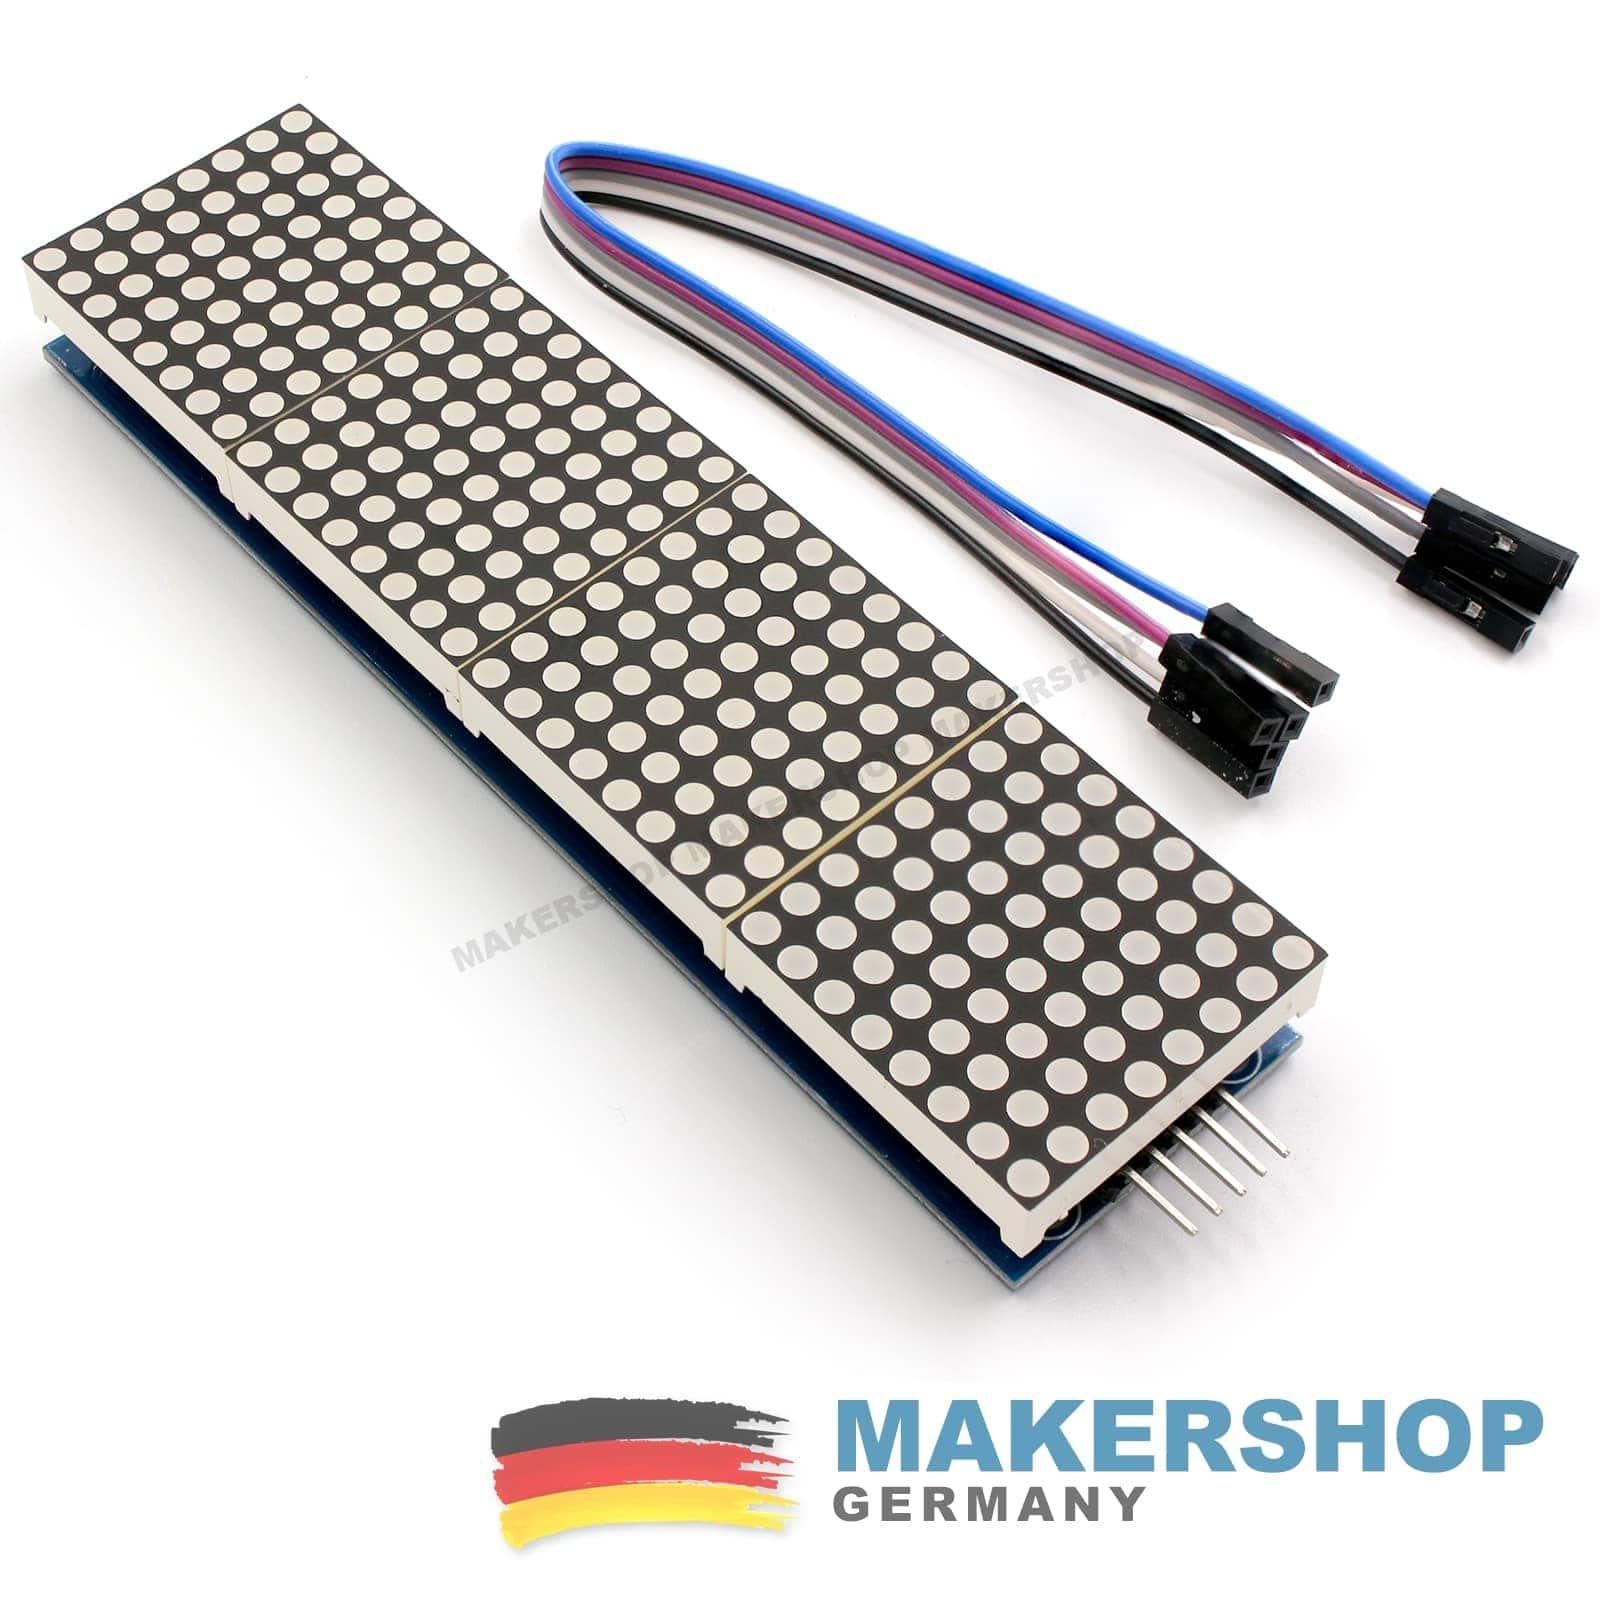 dot matrix modul 8x8 display arduino 4 matrix max7219 led. Black Bedroom Furniture Sets. Home Design Ideas